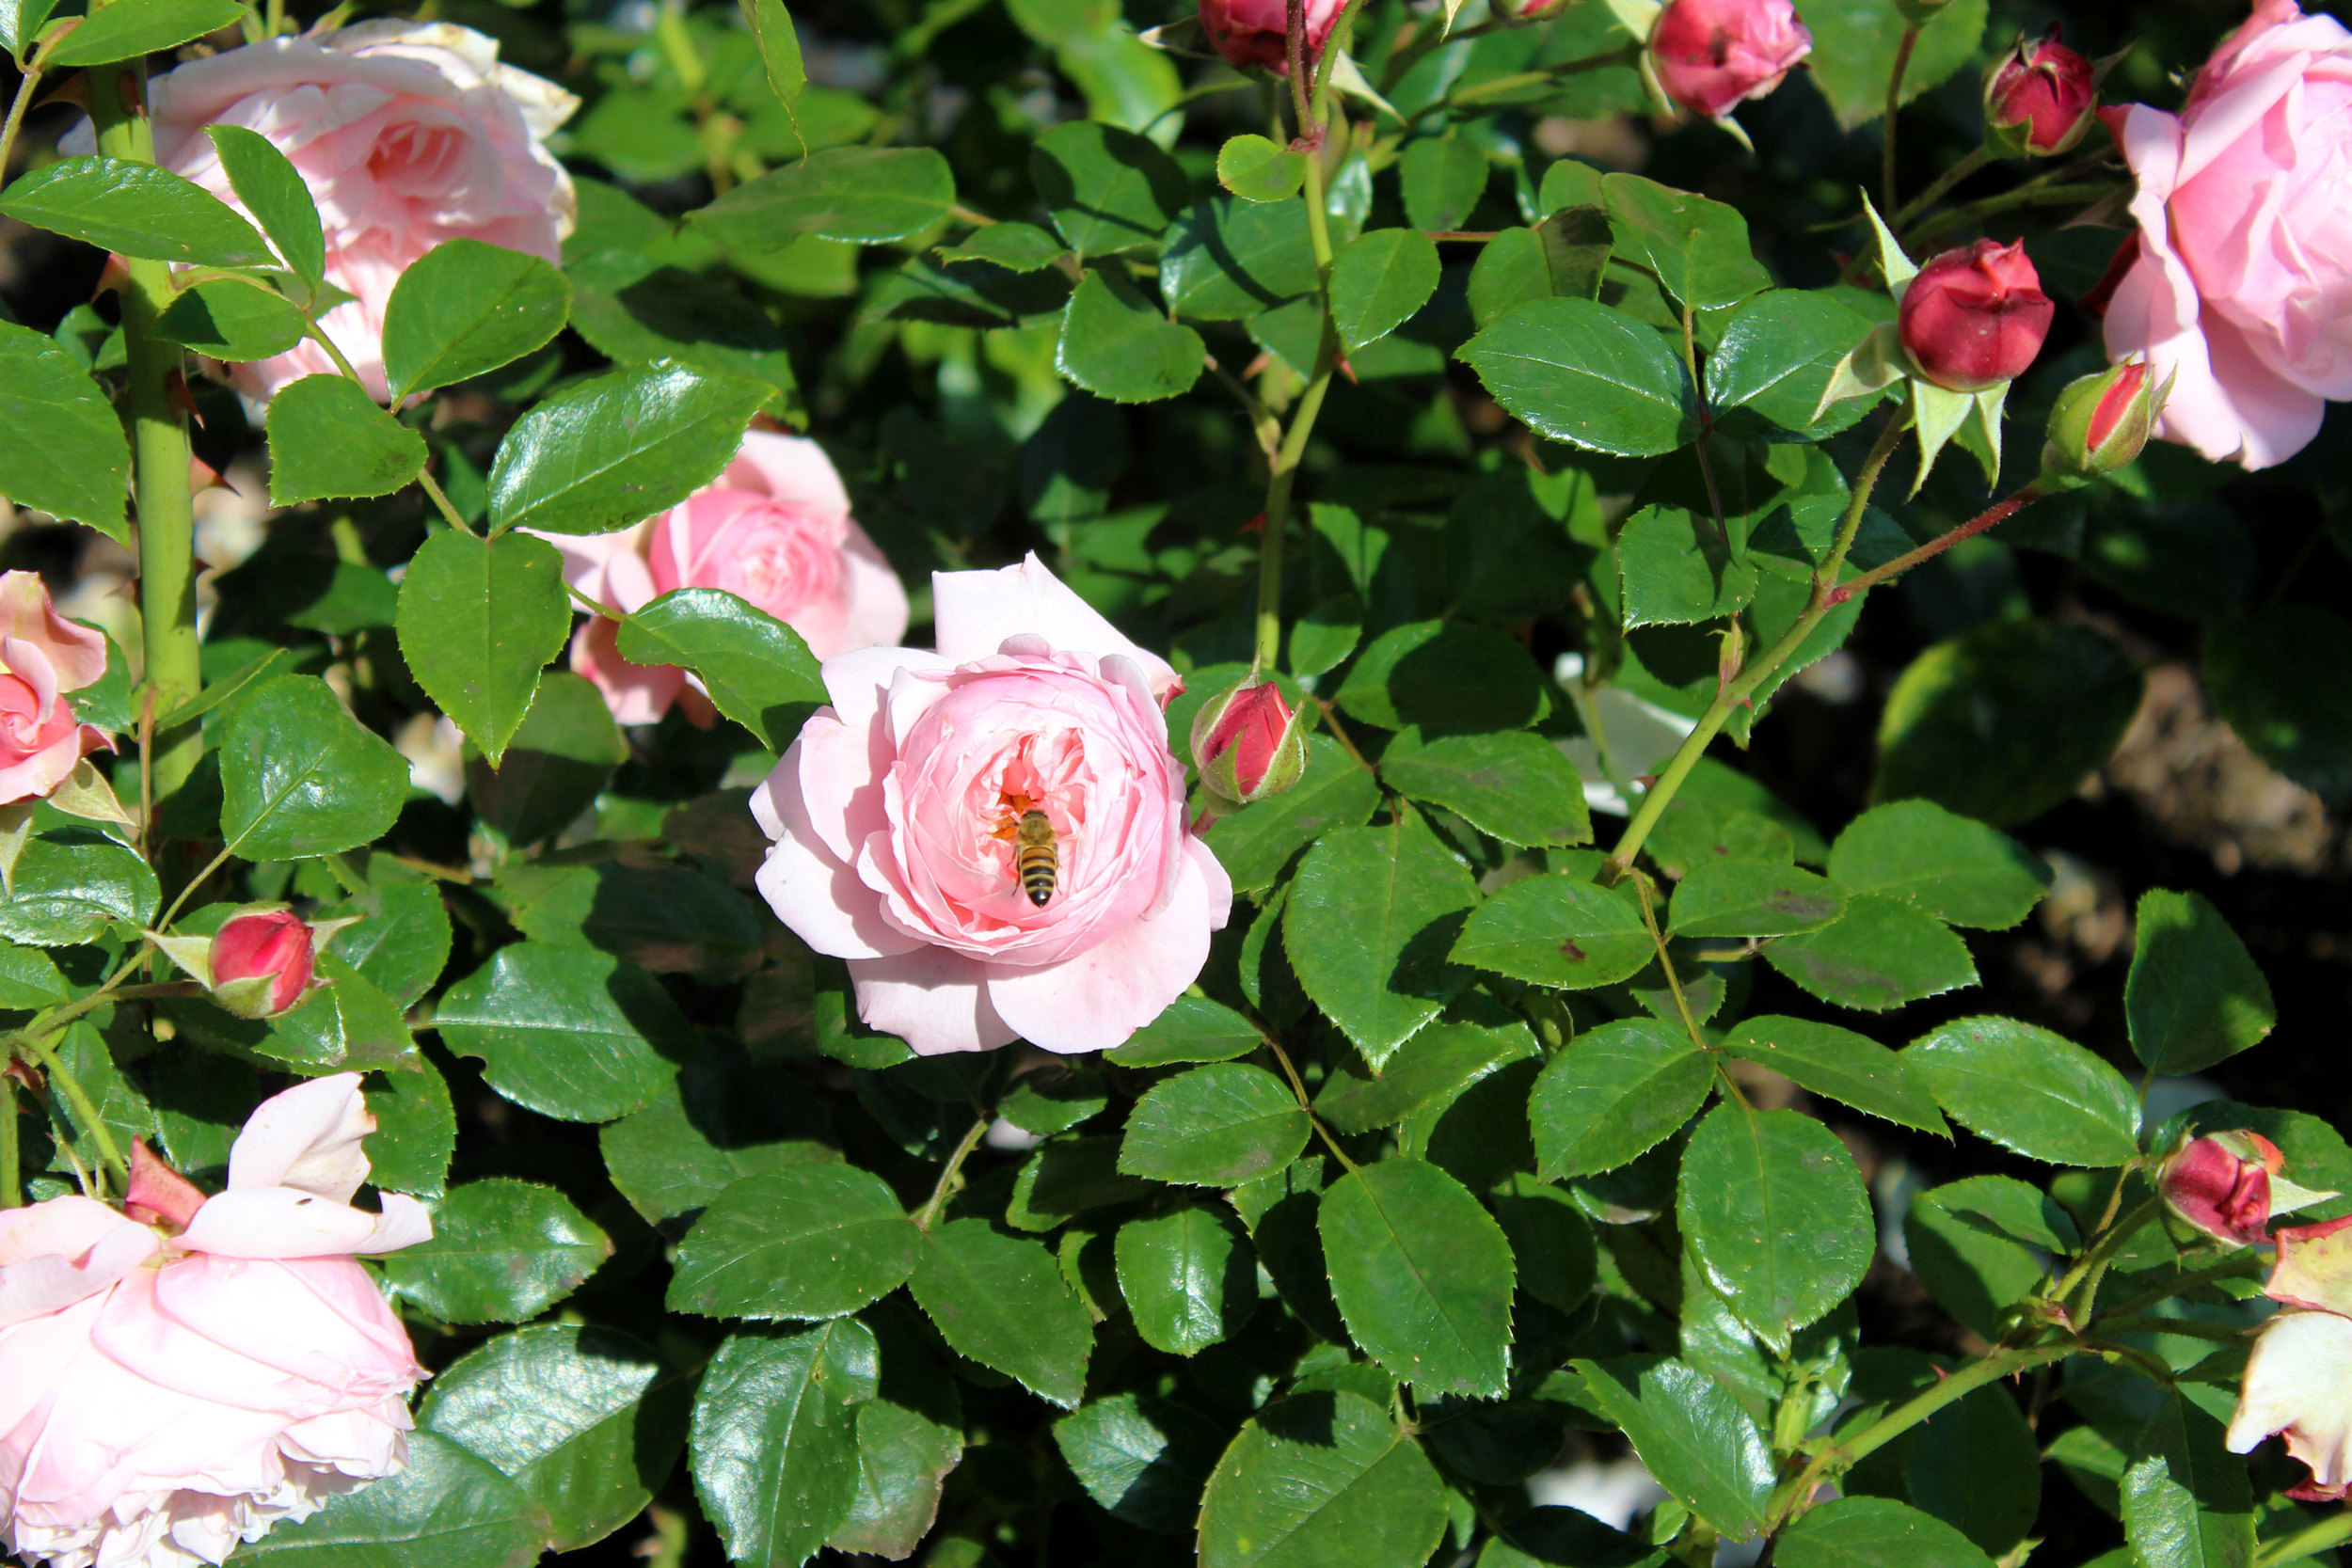 Pink garden rose in London.